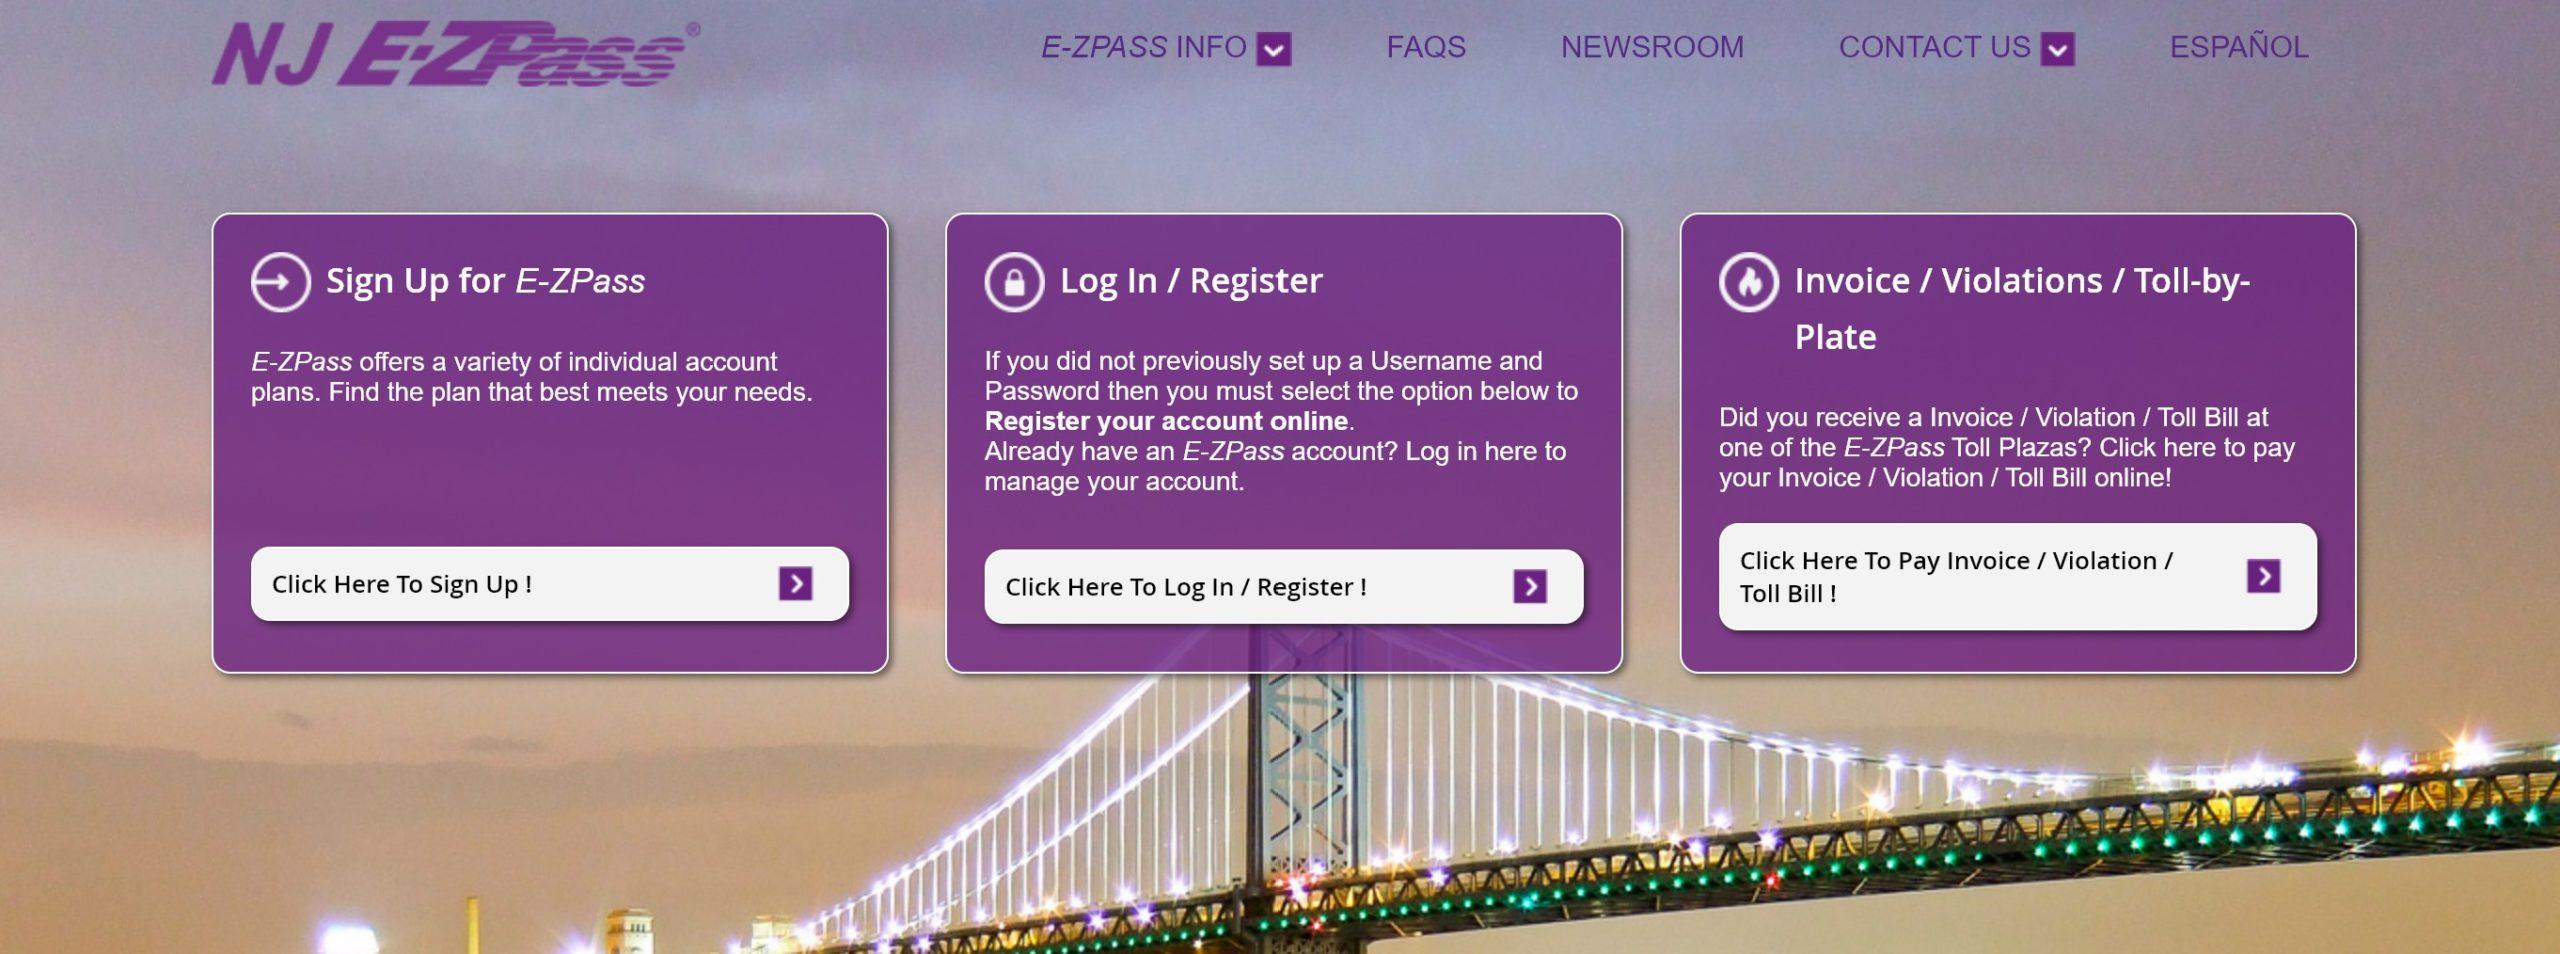 New Jersey EZPass NJ Login & Pay Bill Online @ www.ezpassnj.com